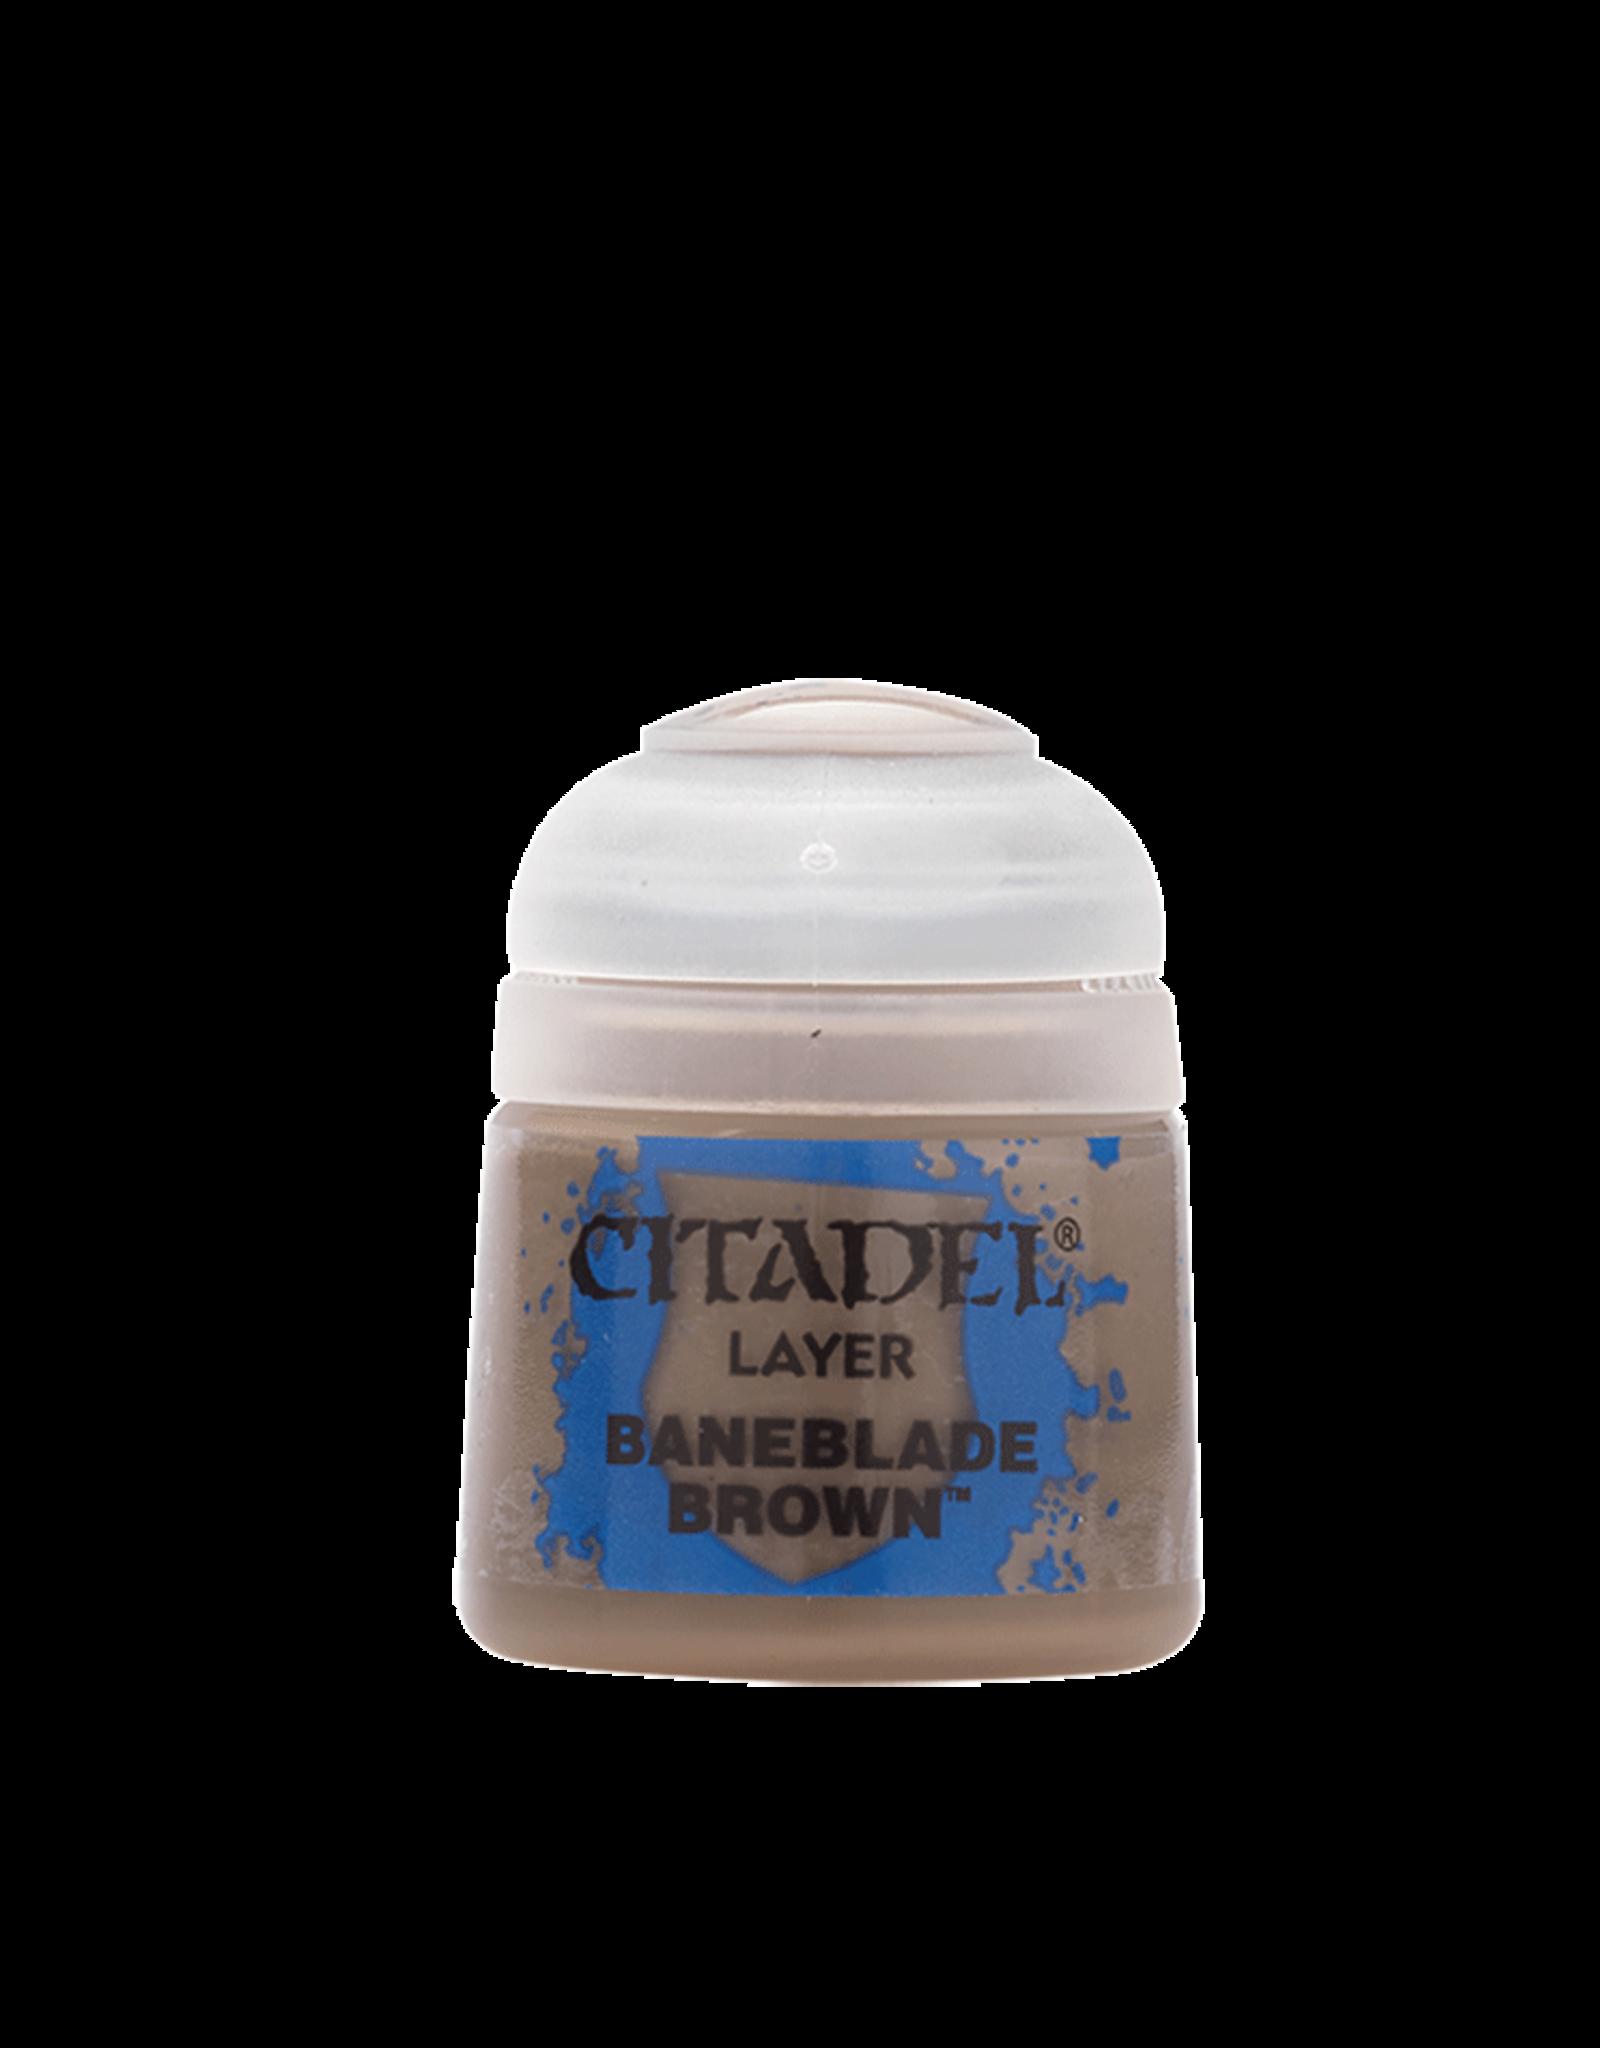 Citadel Citadel Layer: Baneblade Brown (12ml)